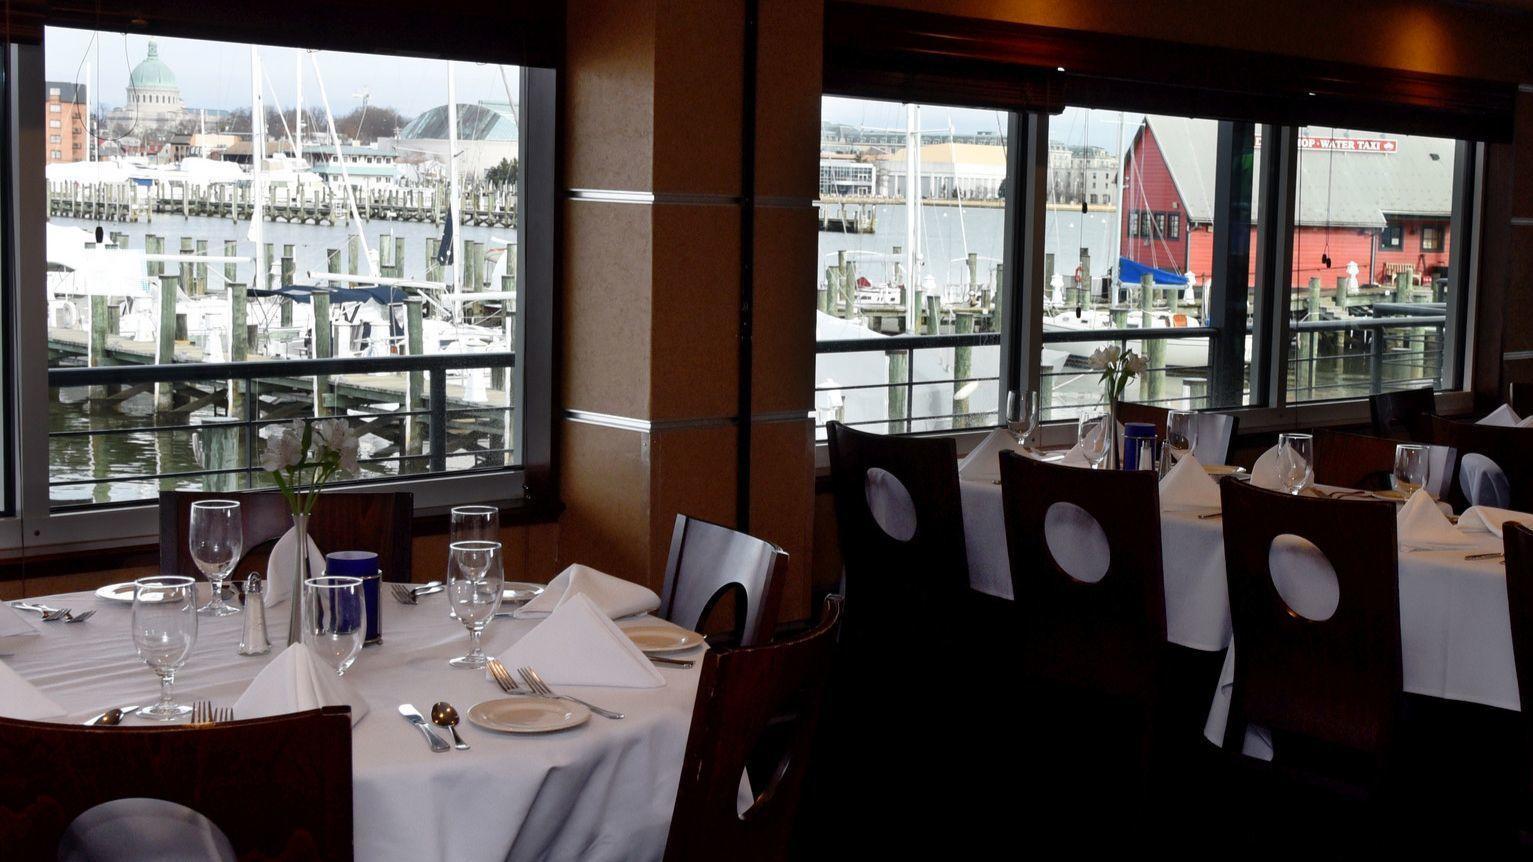 Anne arundel casino restaurants prototype 2 the game trailer